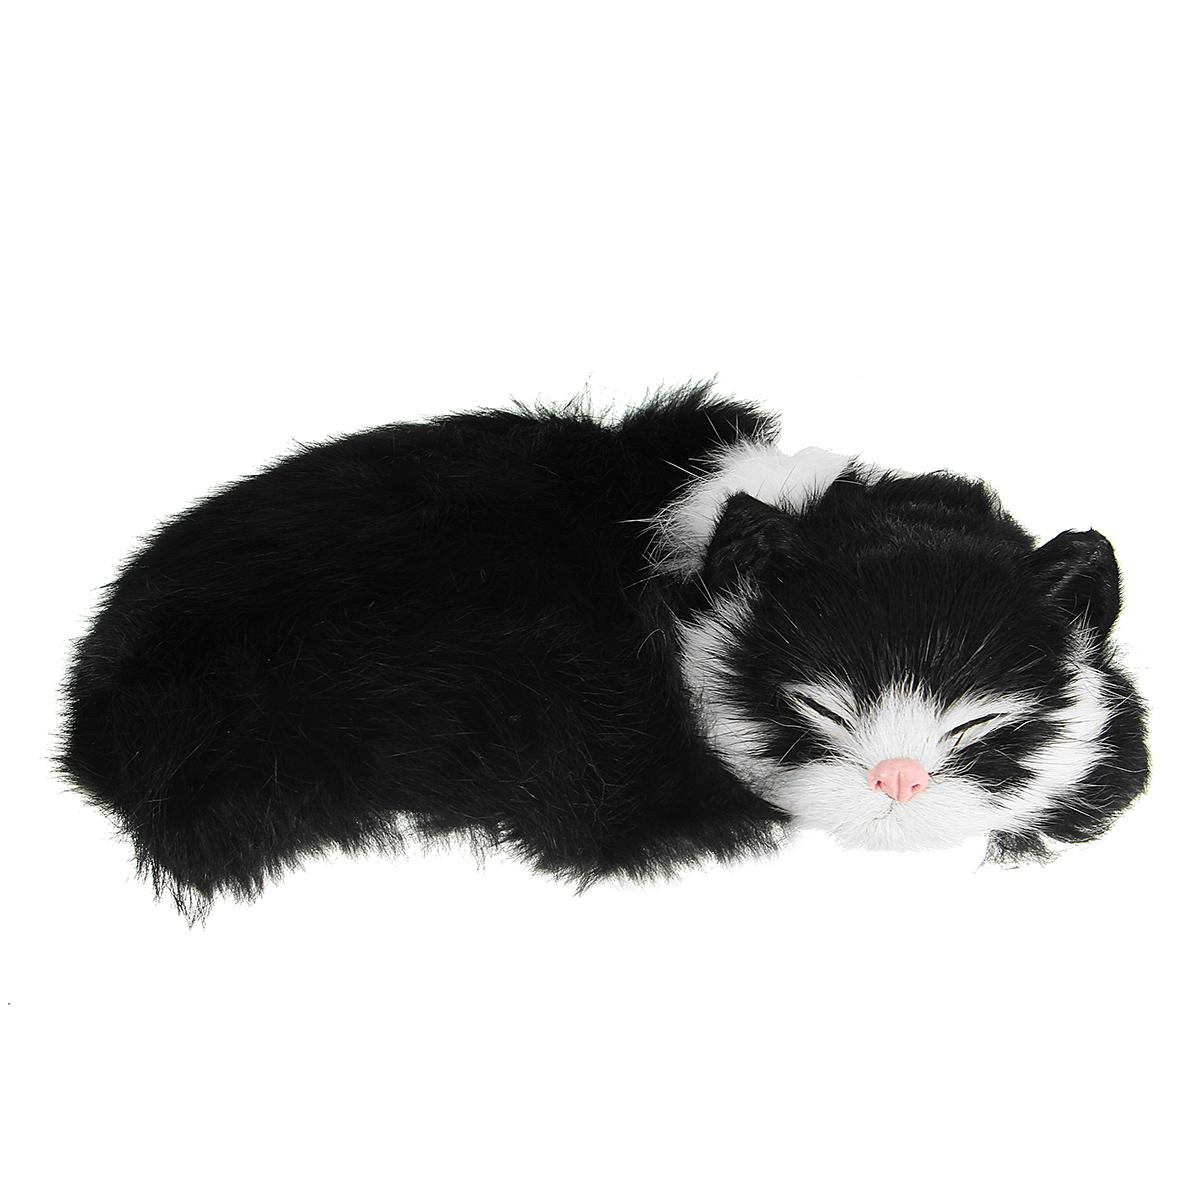 Realistic Sleeping Cat Lifelike Plush Fake Kitten Fur Furry Animal Figurine  Toys Home Decorations